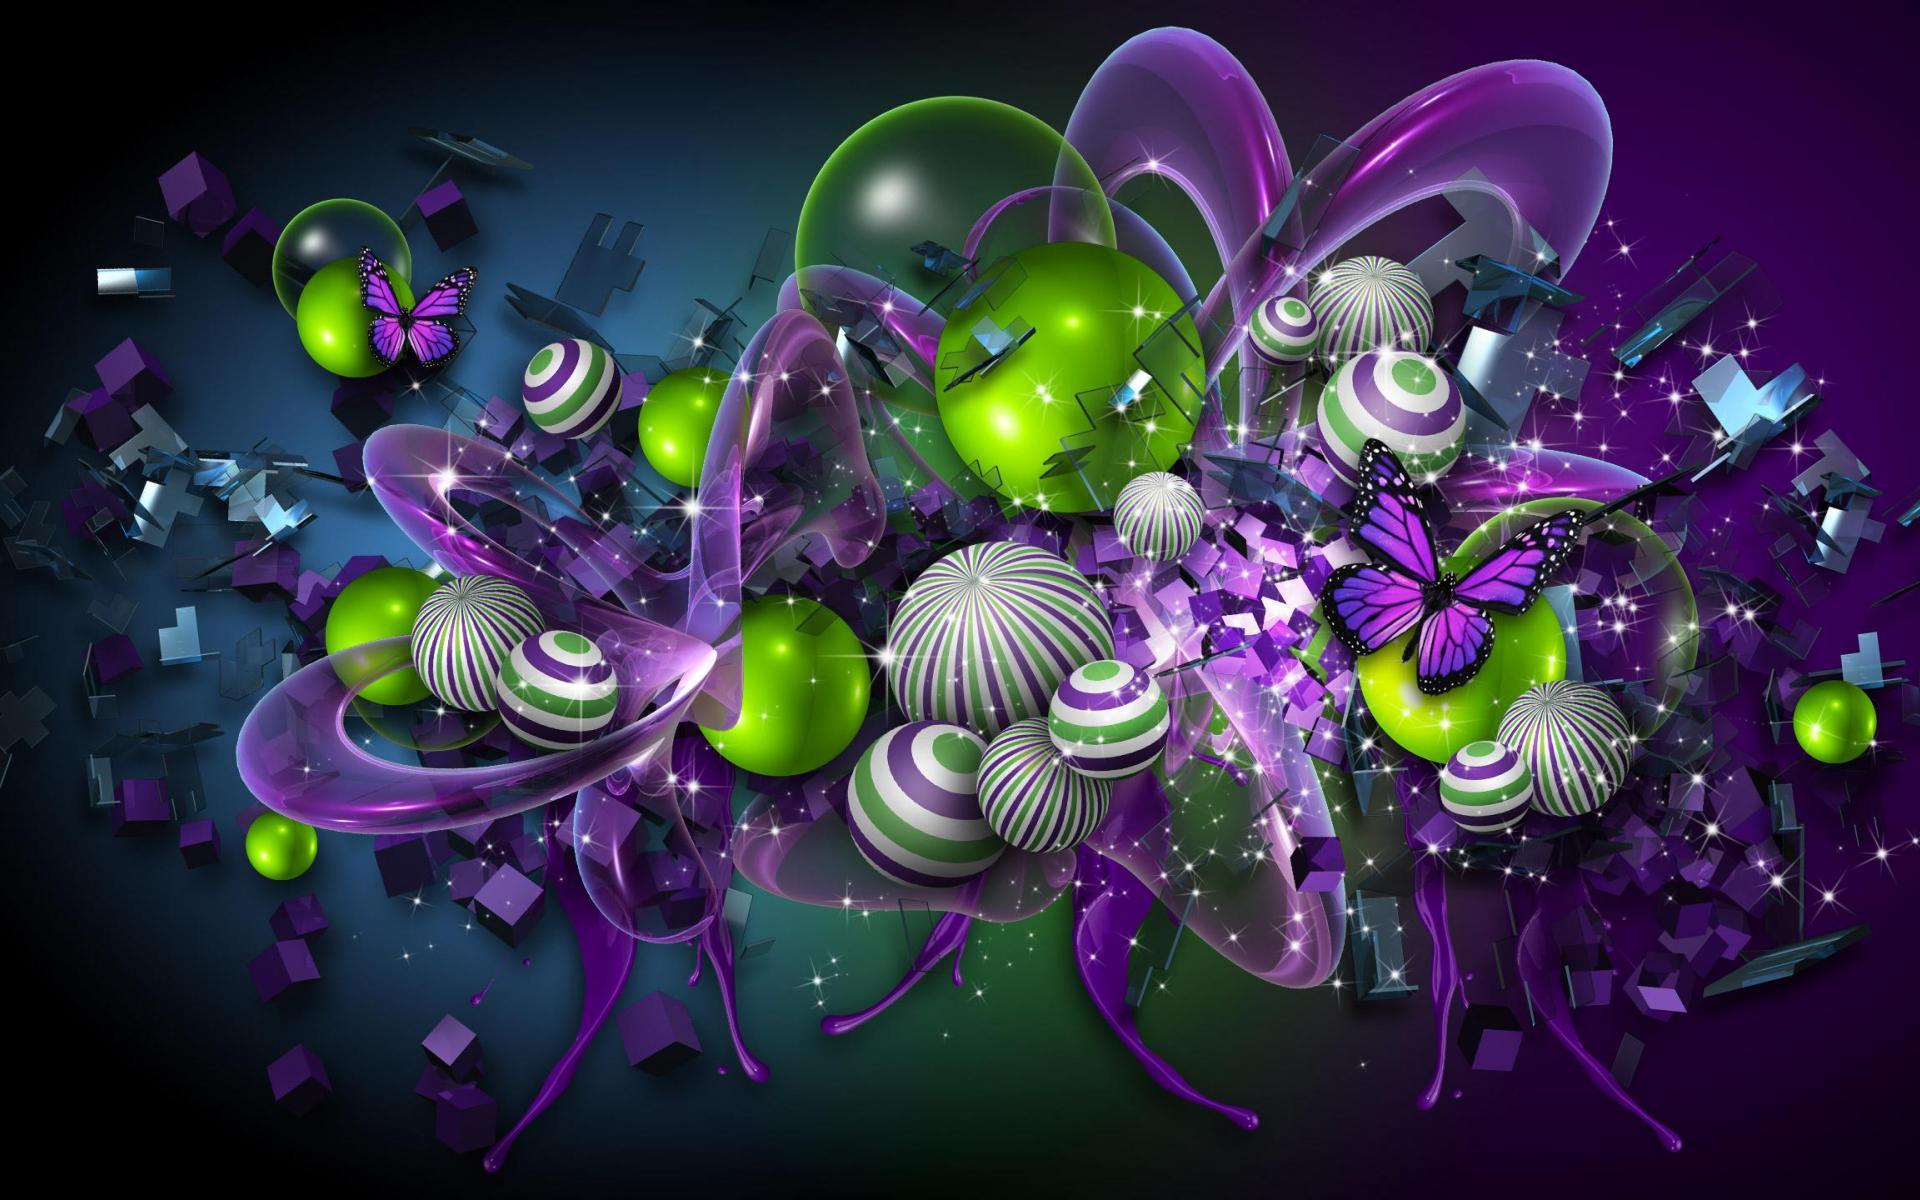 Cool Colorful Apple Wallpaper Designs   1998269 1920x1200